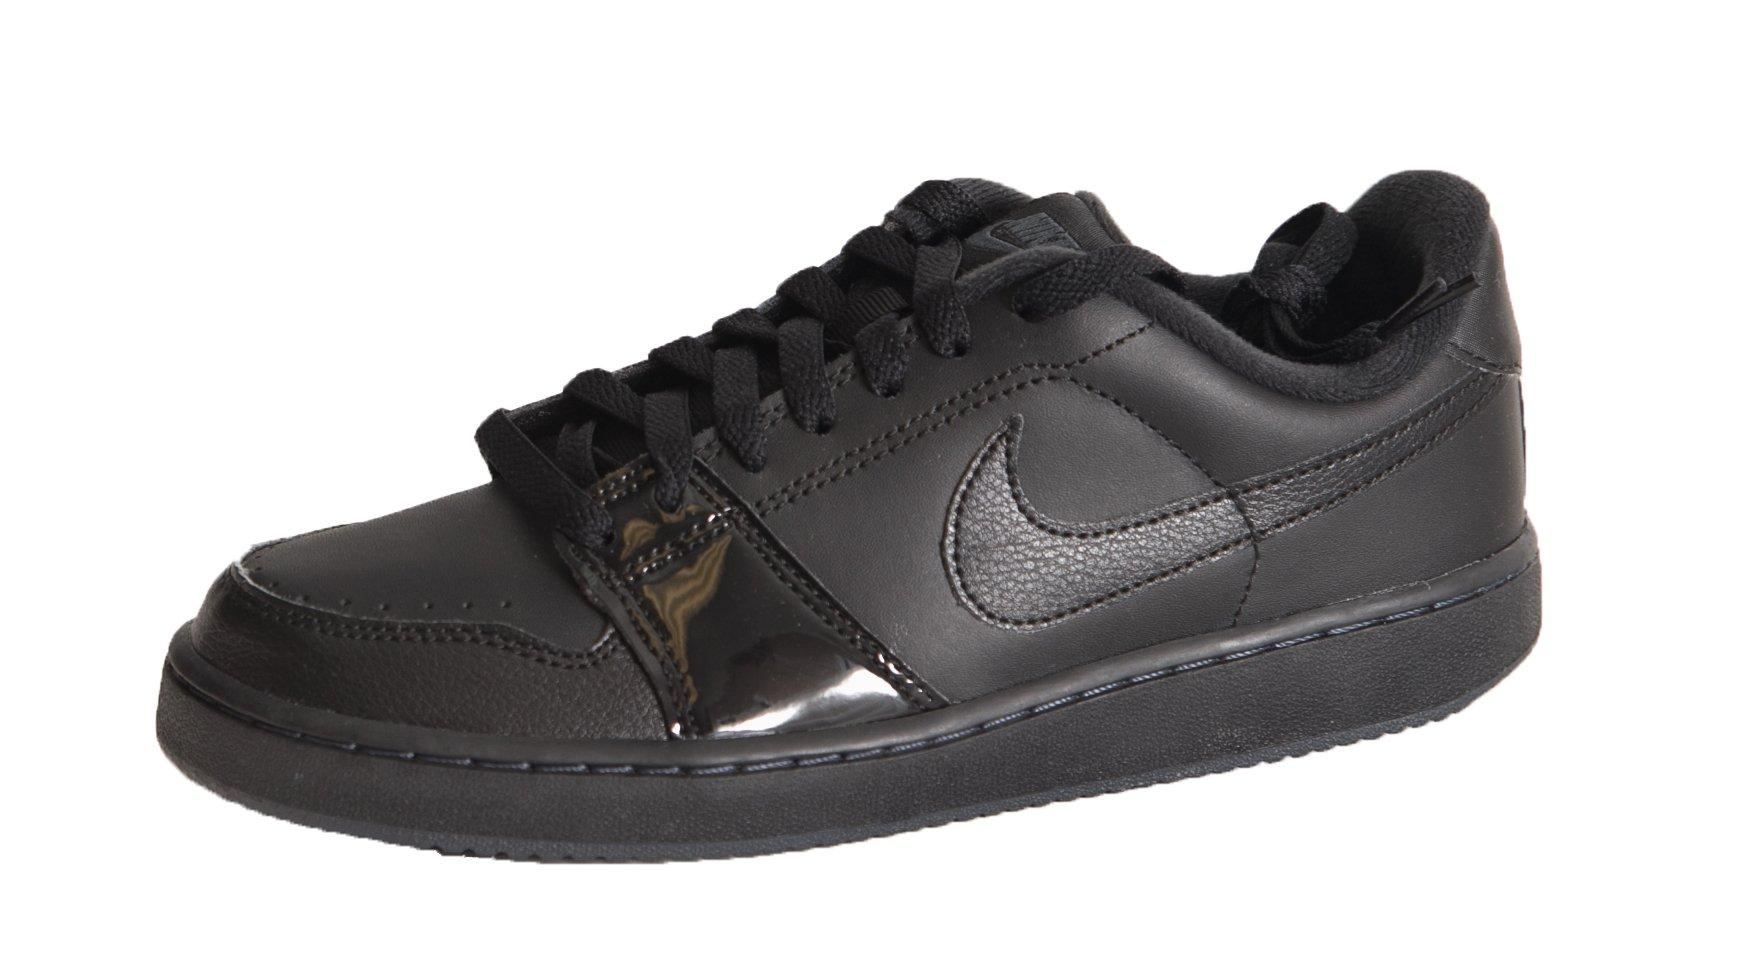 Nike frauen rückwand schwarze skate - schuhe schuhe schuhe 386110-012 b0def0